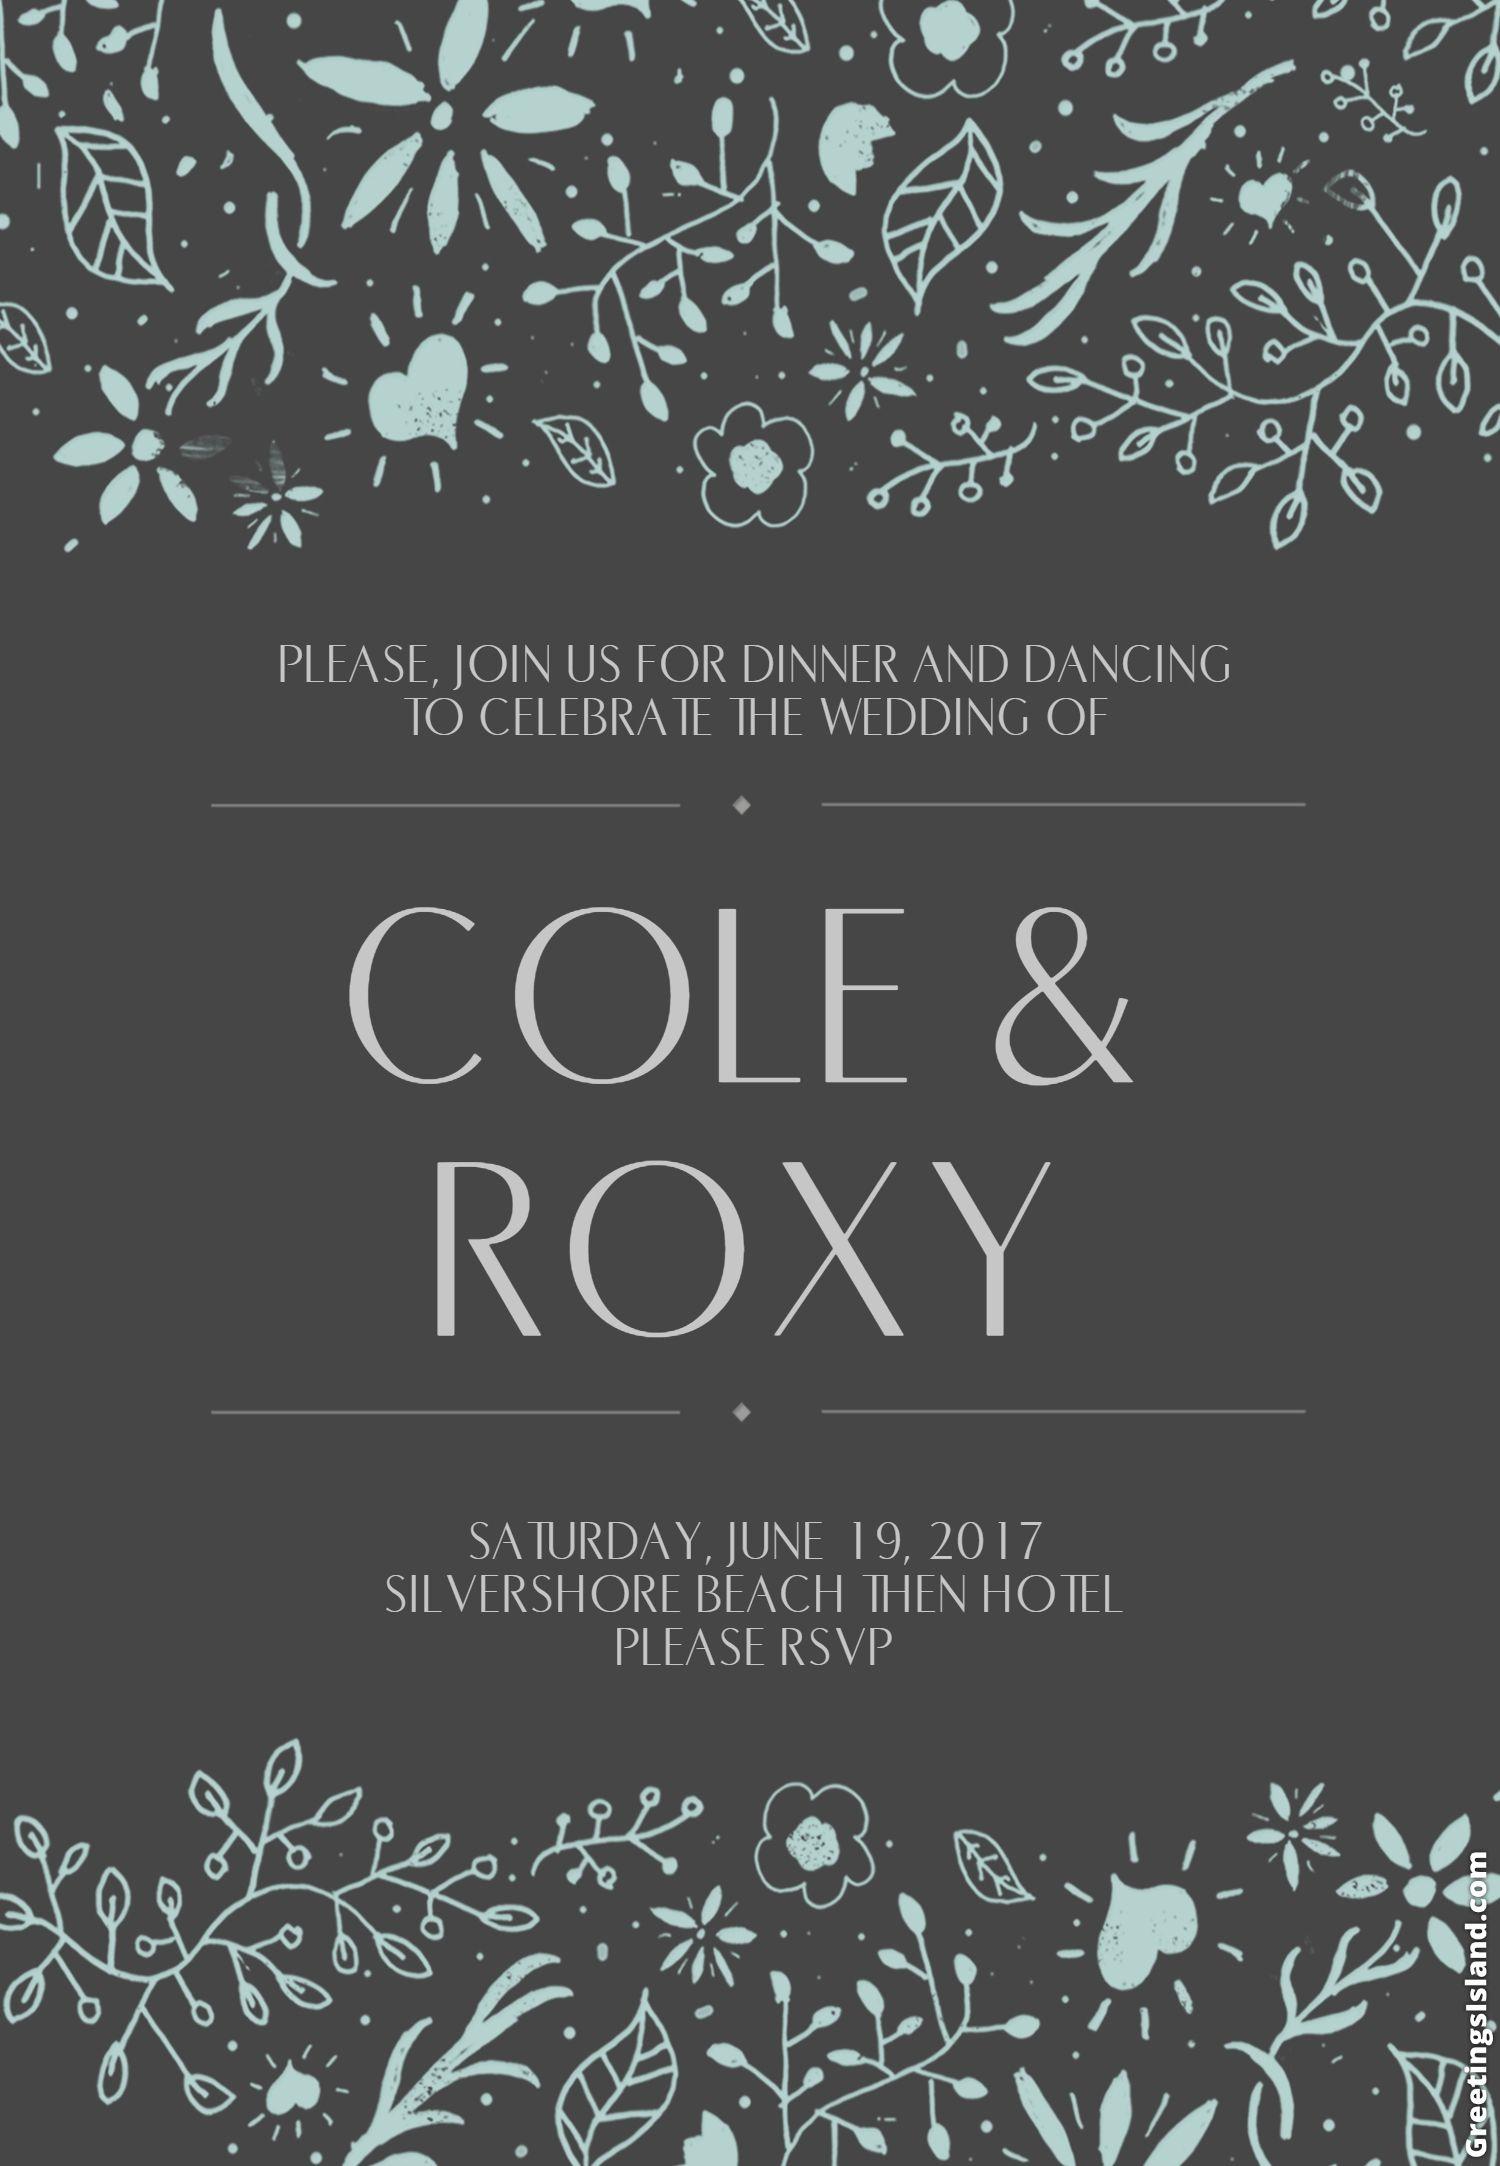 Wedding invitation from website Wedding invitations